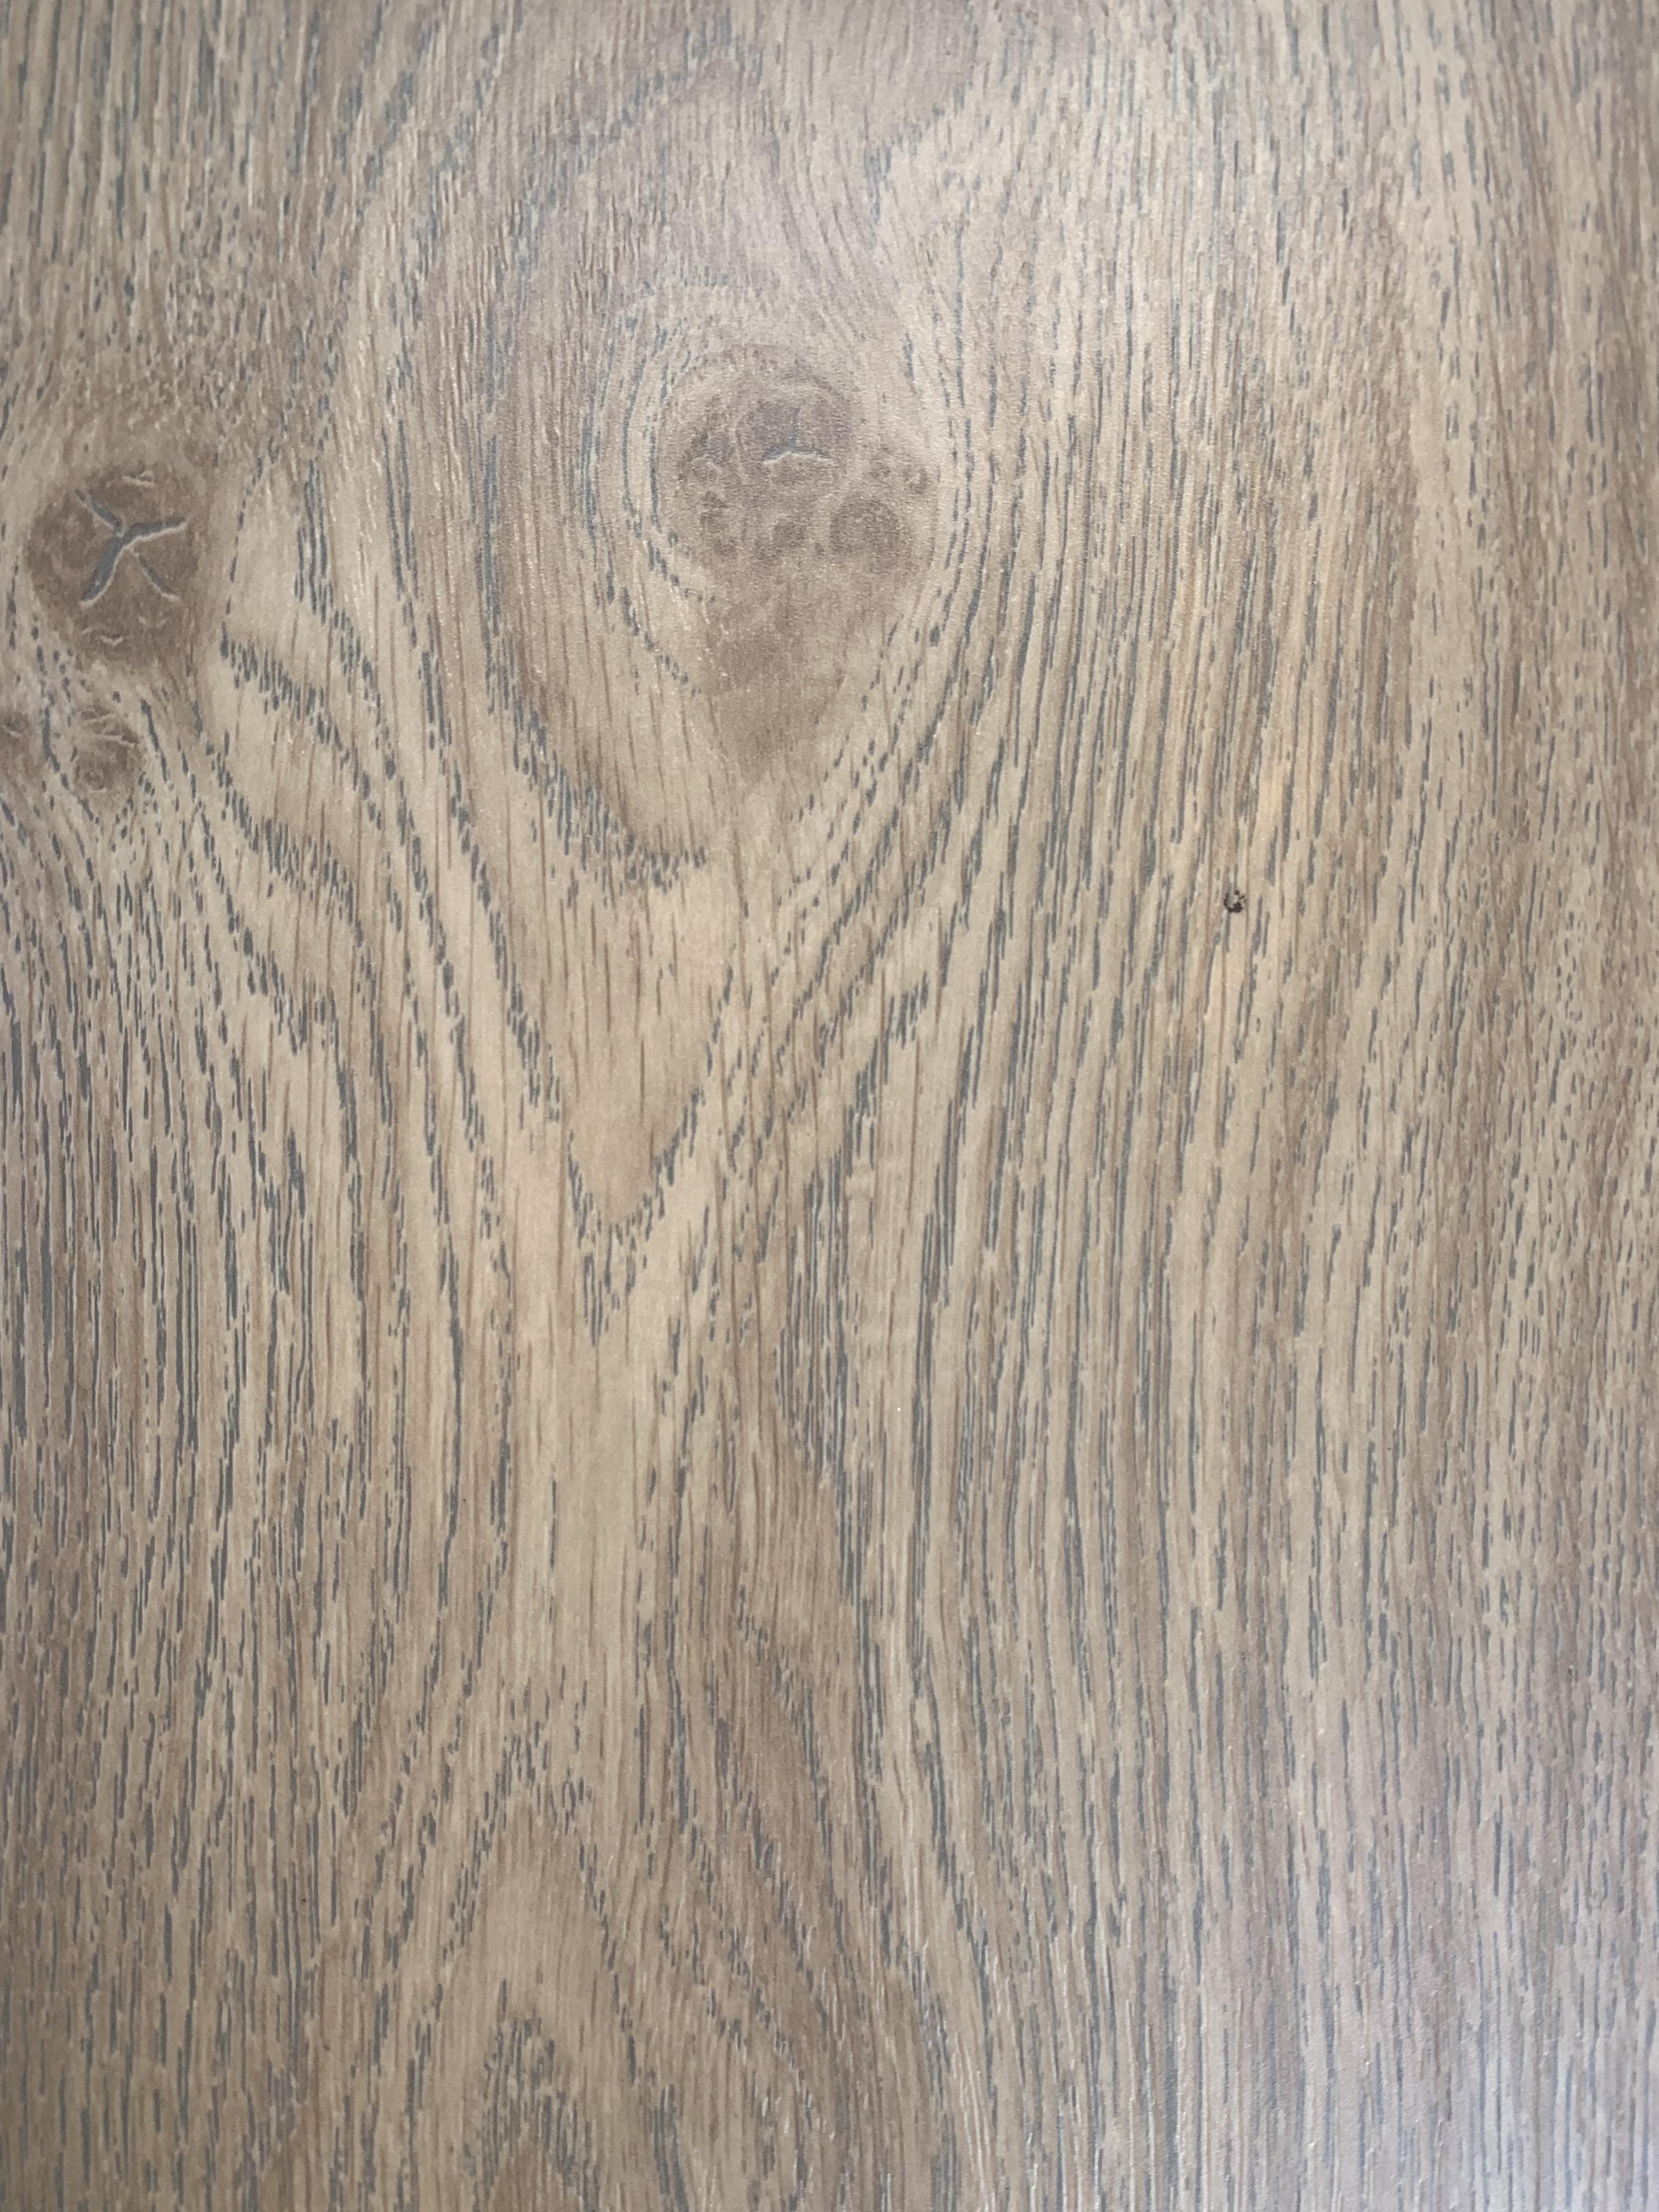 Sandy Oak Laminate Flooring 1215x195x12mm